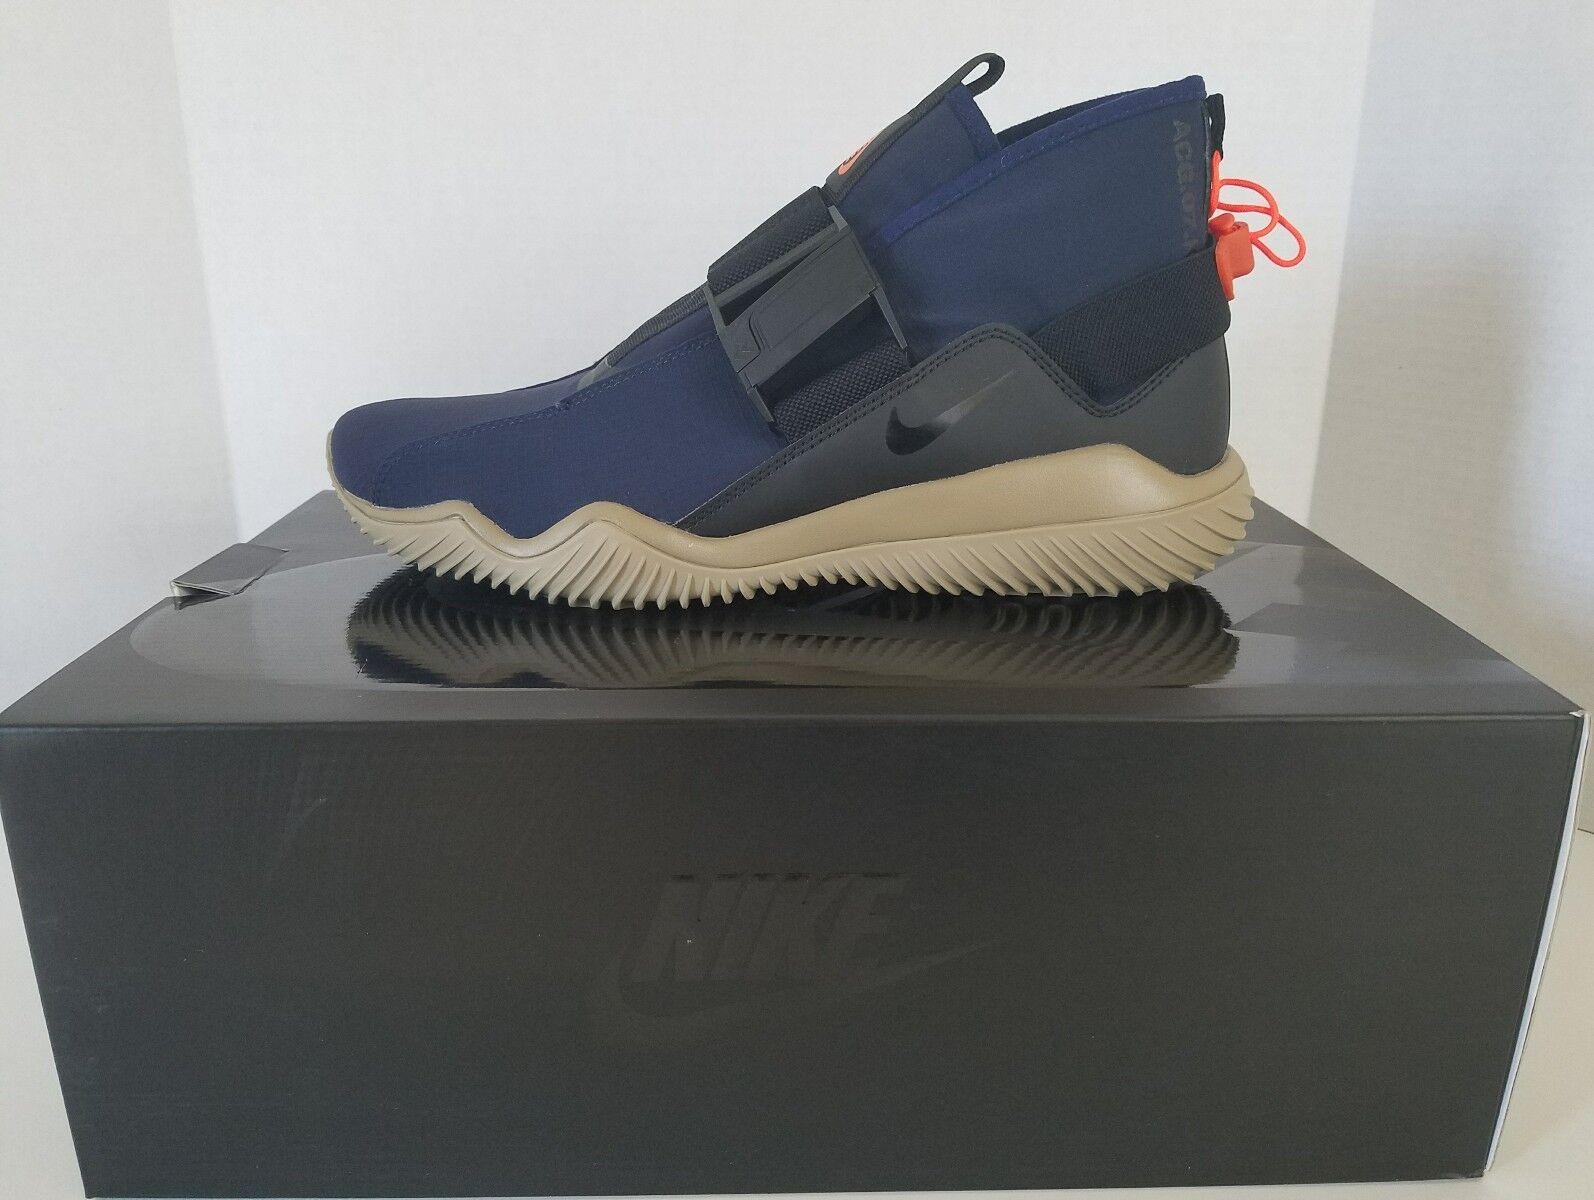 Nike acg kmtr komyuter 07 obsidian / schwarze khaki 902776-401 sz 10